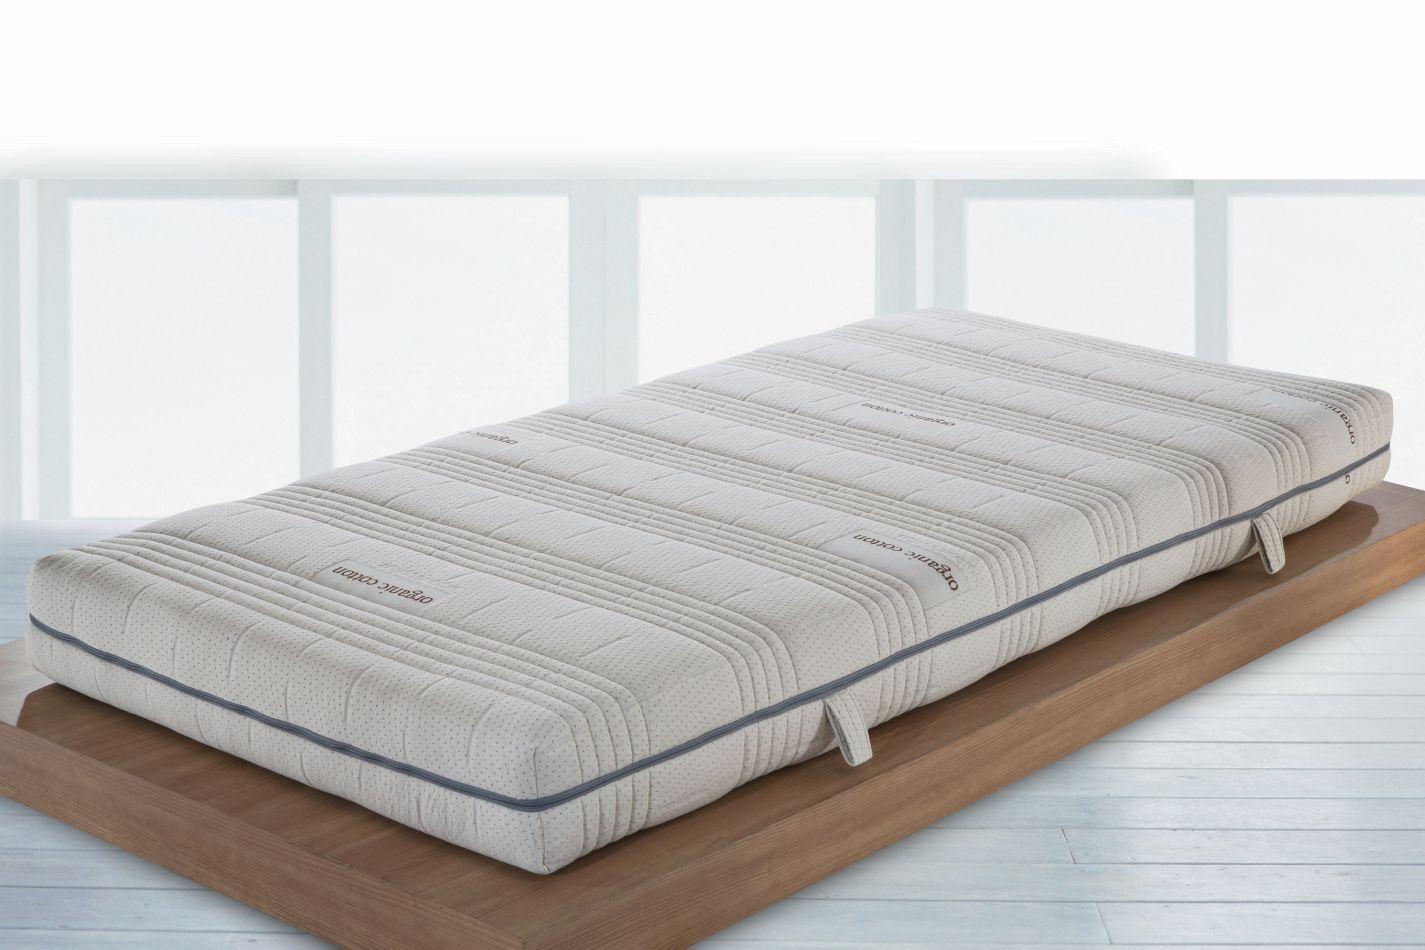 Matratze Latex - Abmessung: 140 x 190 cm